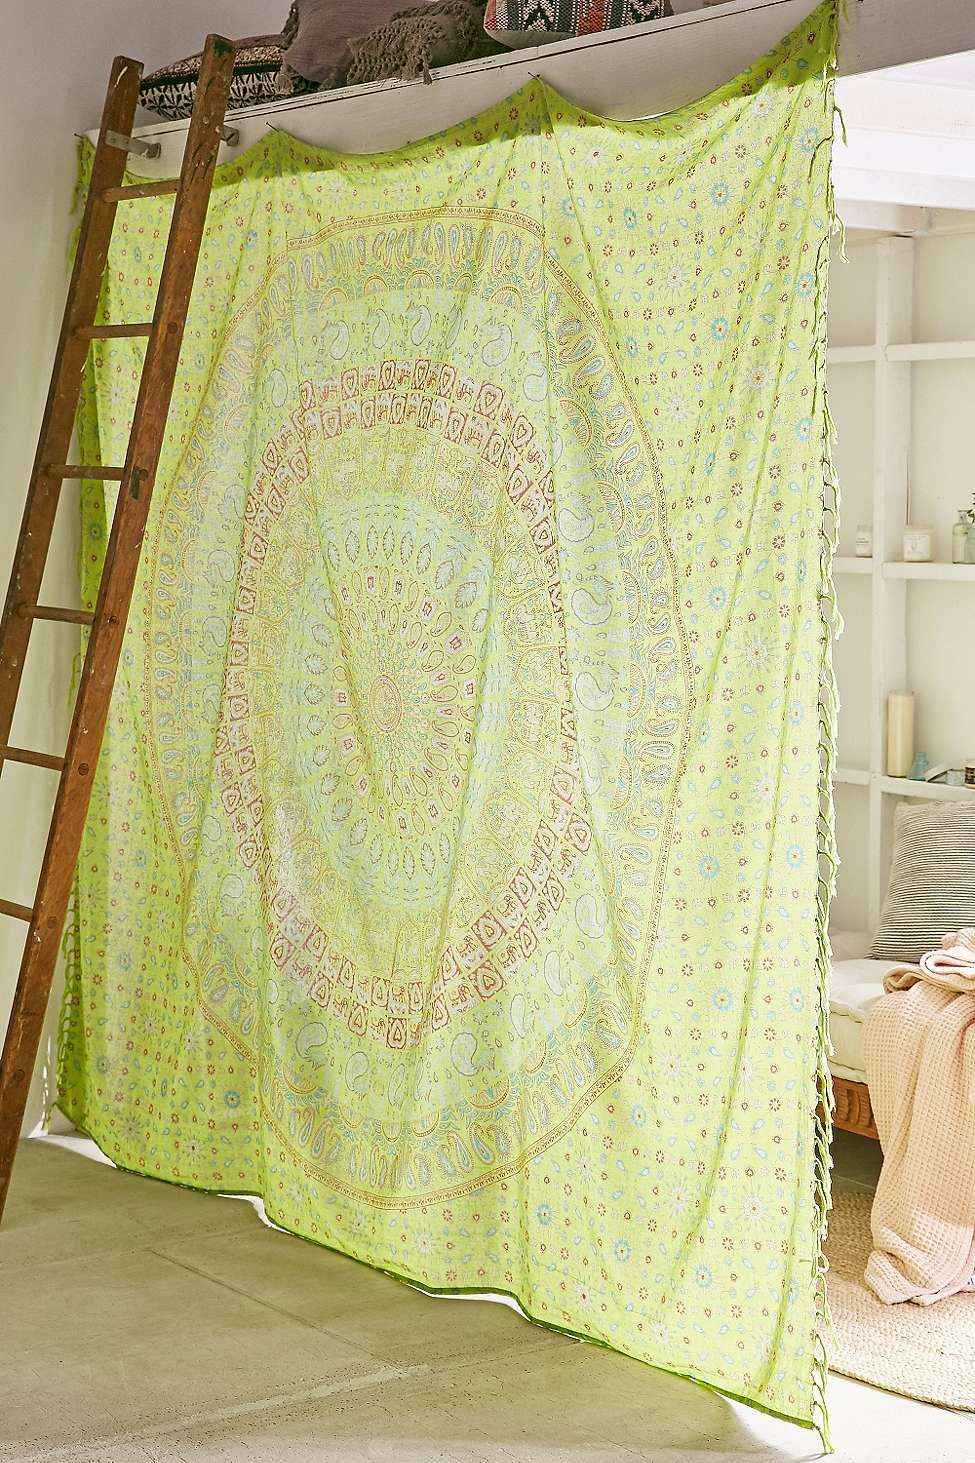 Maina Medallion Tapestry | Interior | Pinterest | Tapestry ...